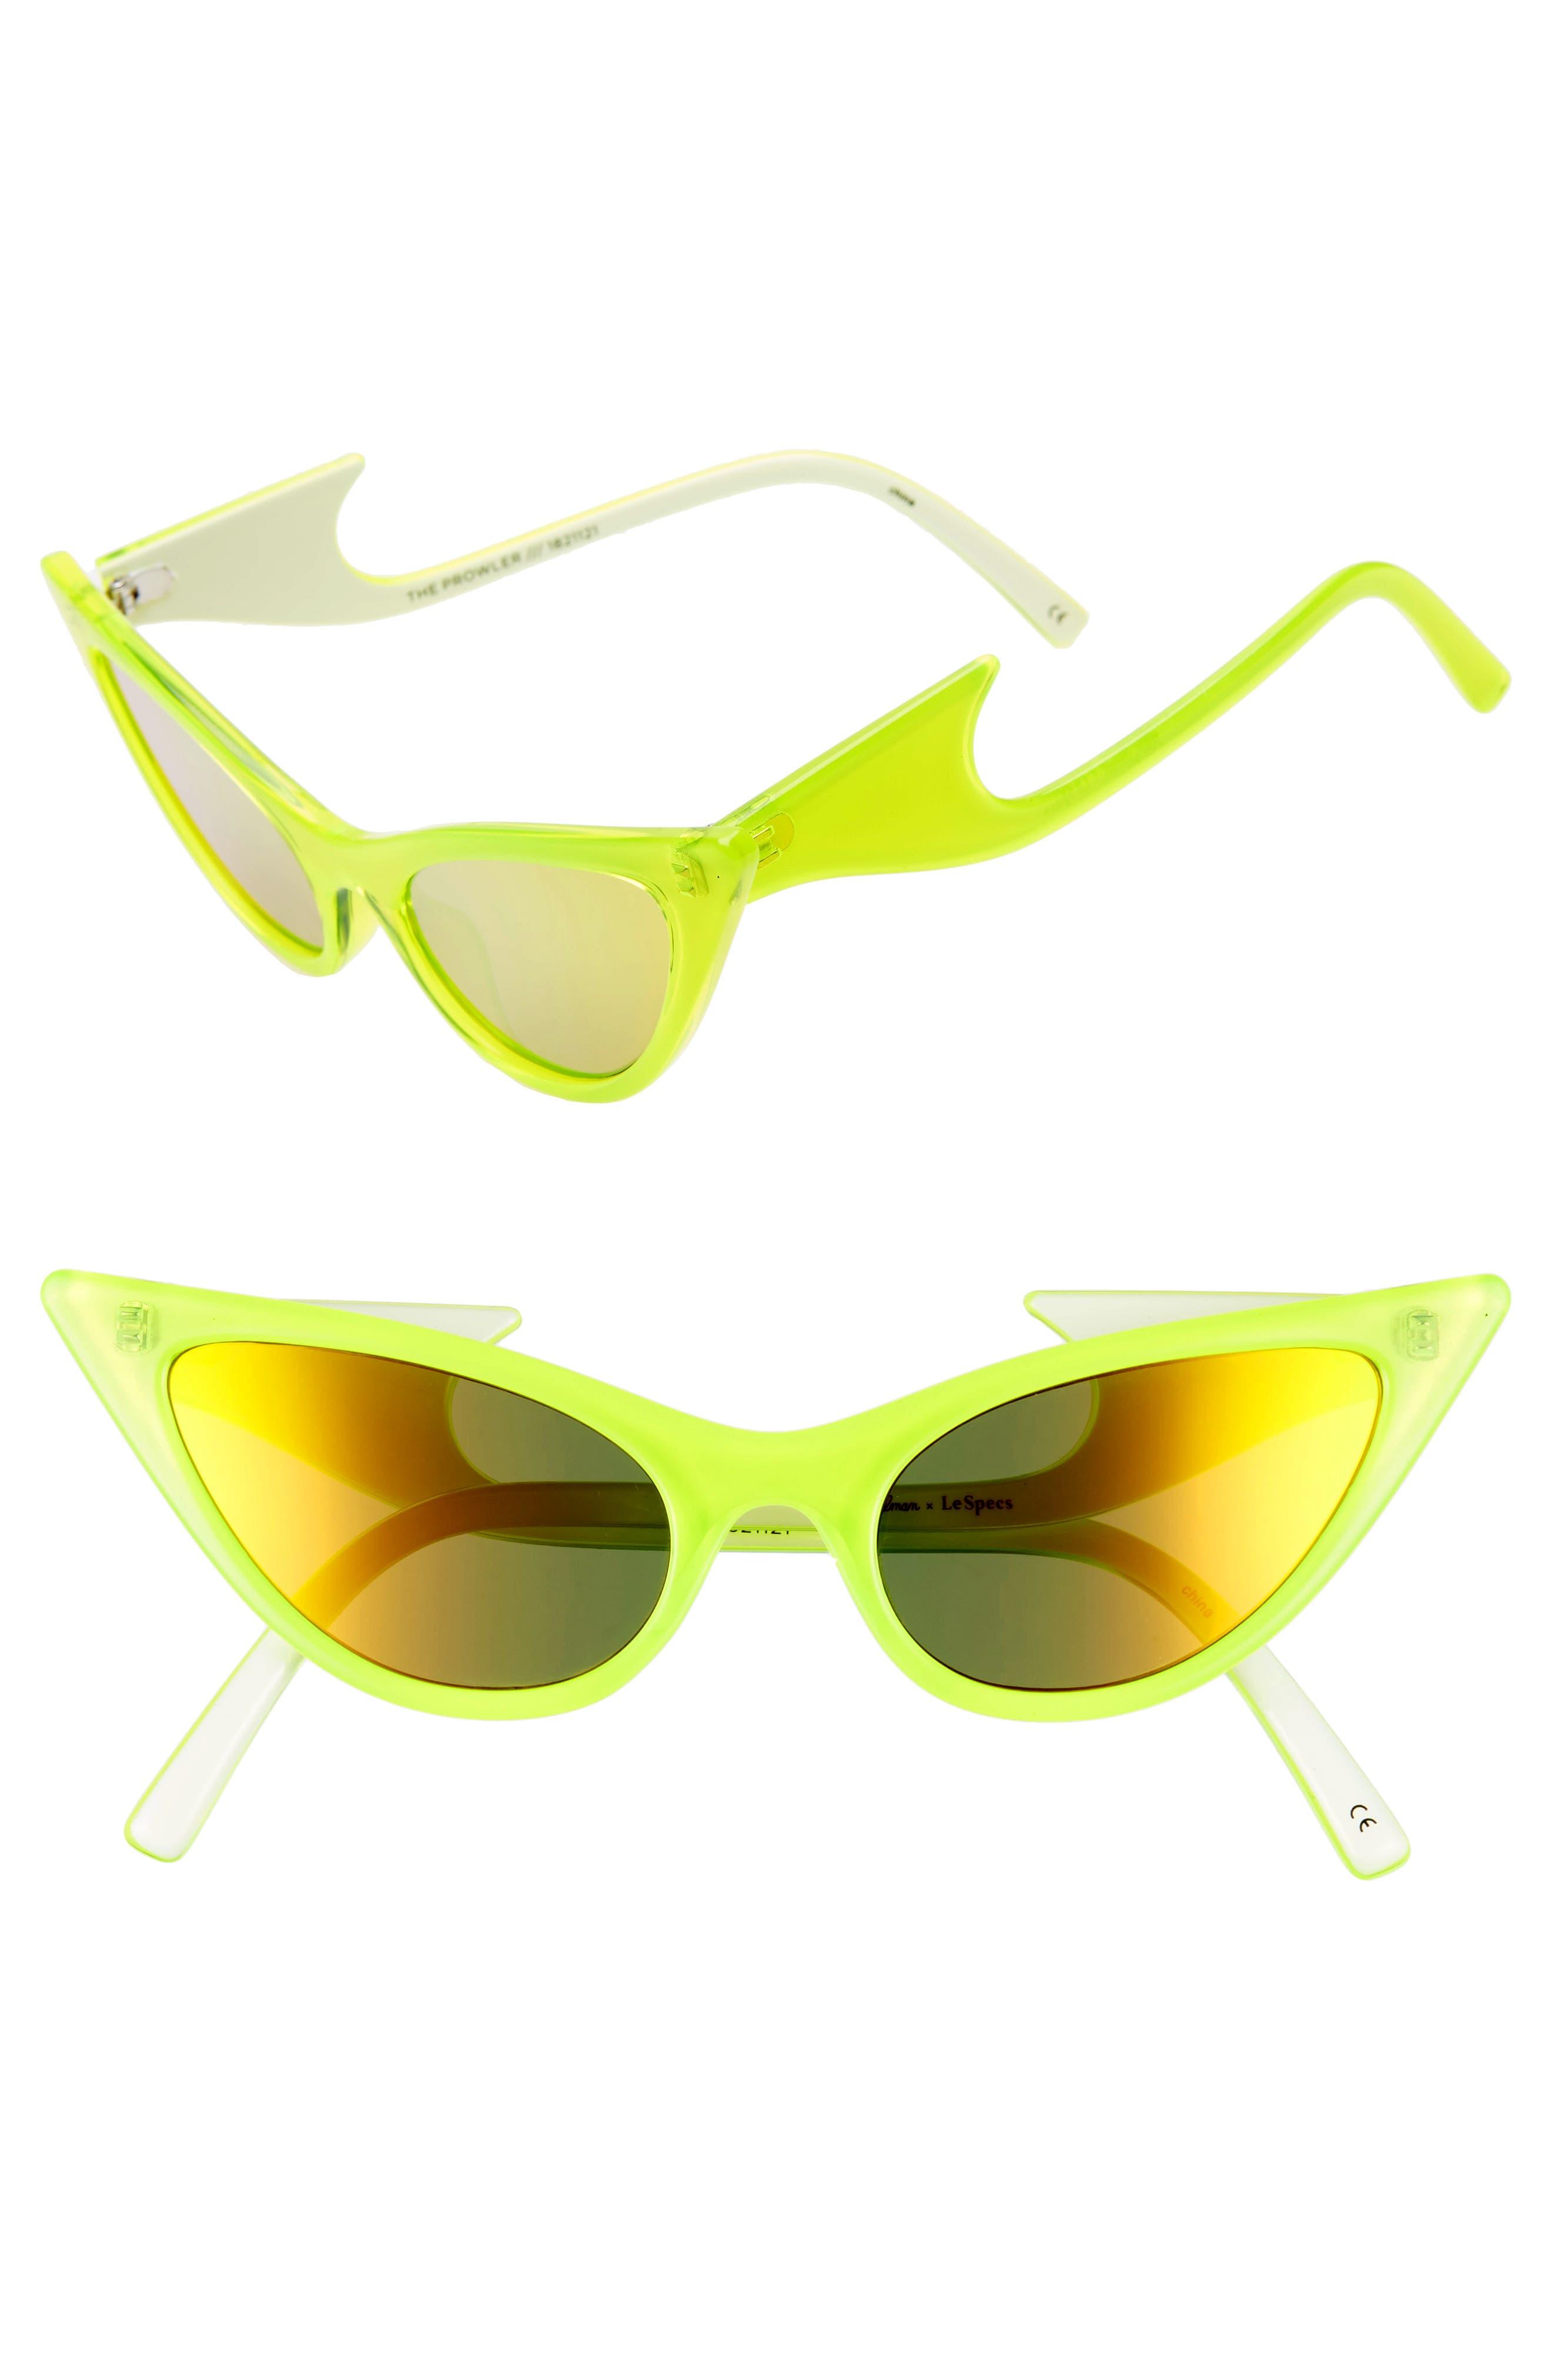 Adam Selman X Le Specs Luxe The Prowler 55Mm Sunglasses - Neon Yellow